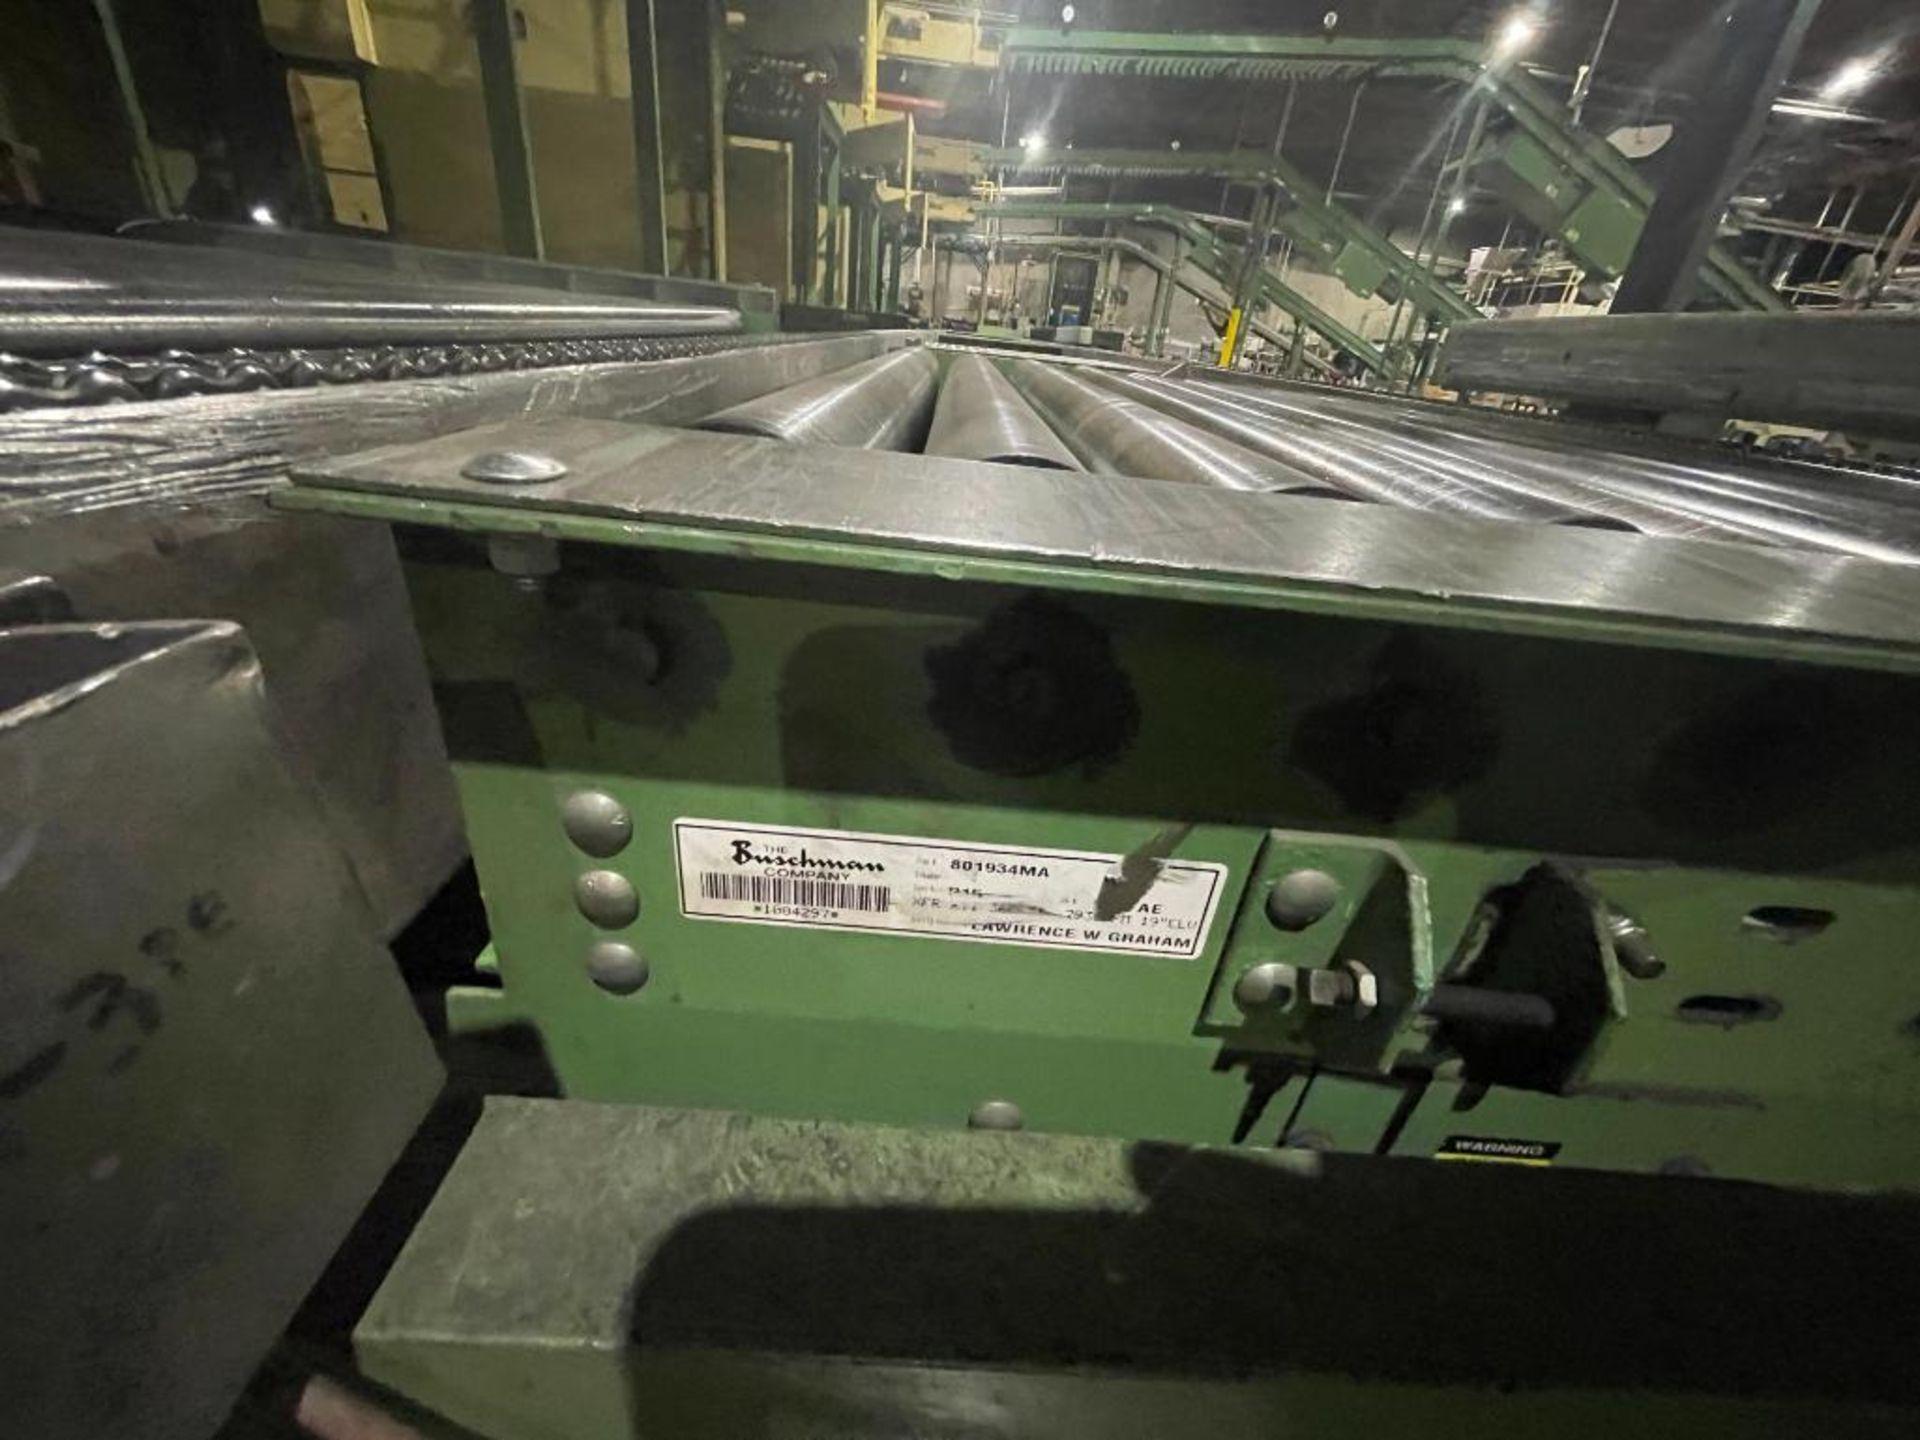 Buschman full pallet conveyor - Image 3 of 12